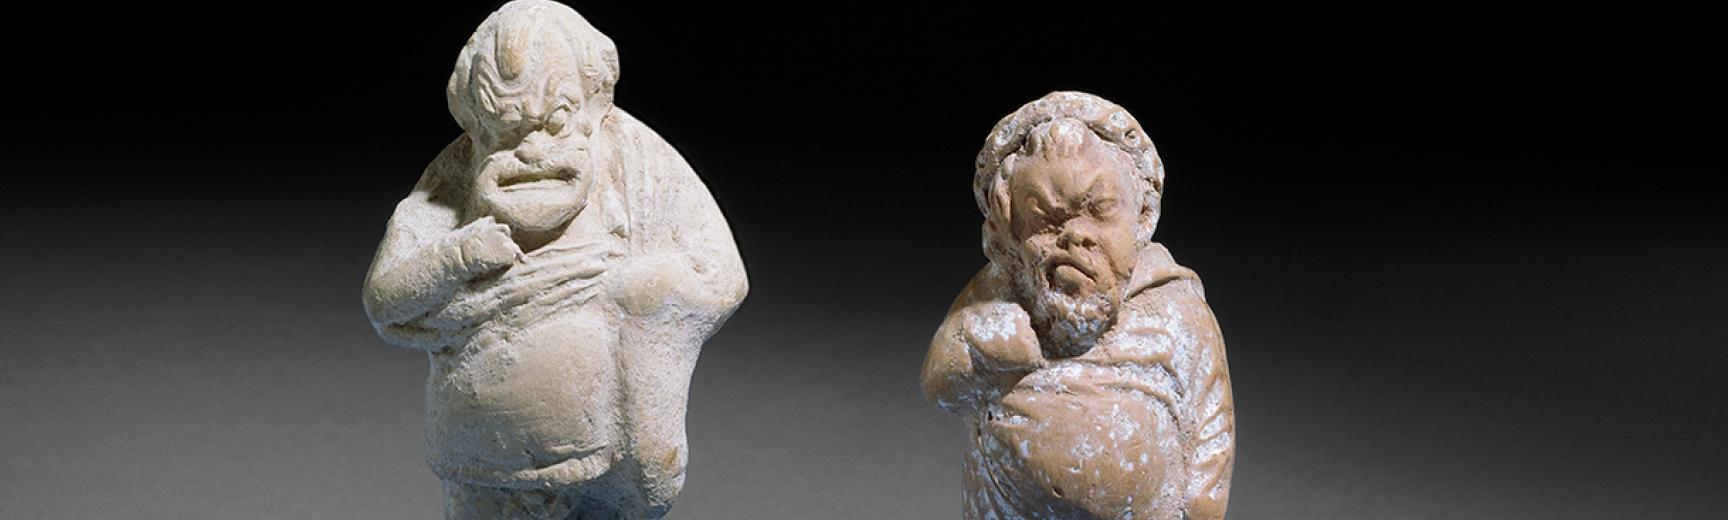 Terracotta figurine of a Comic Male Actor